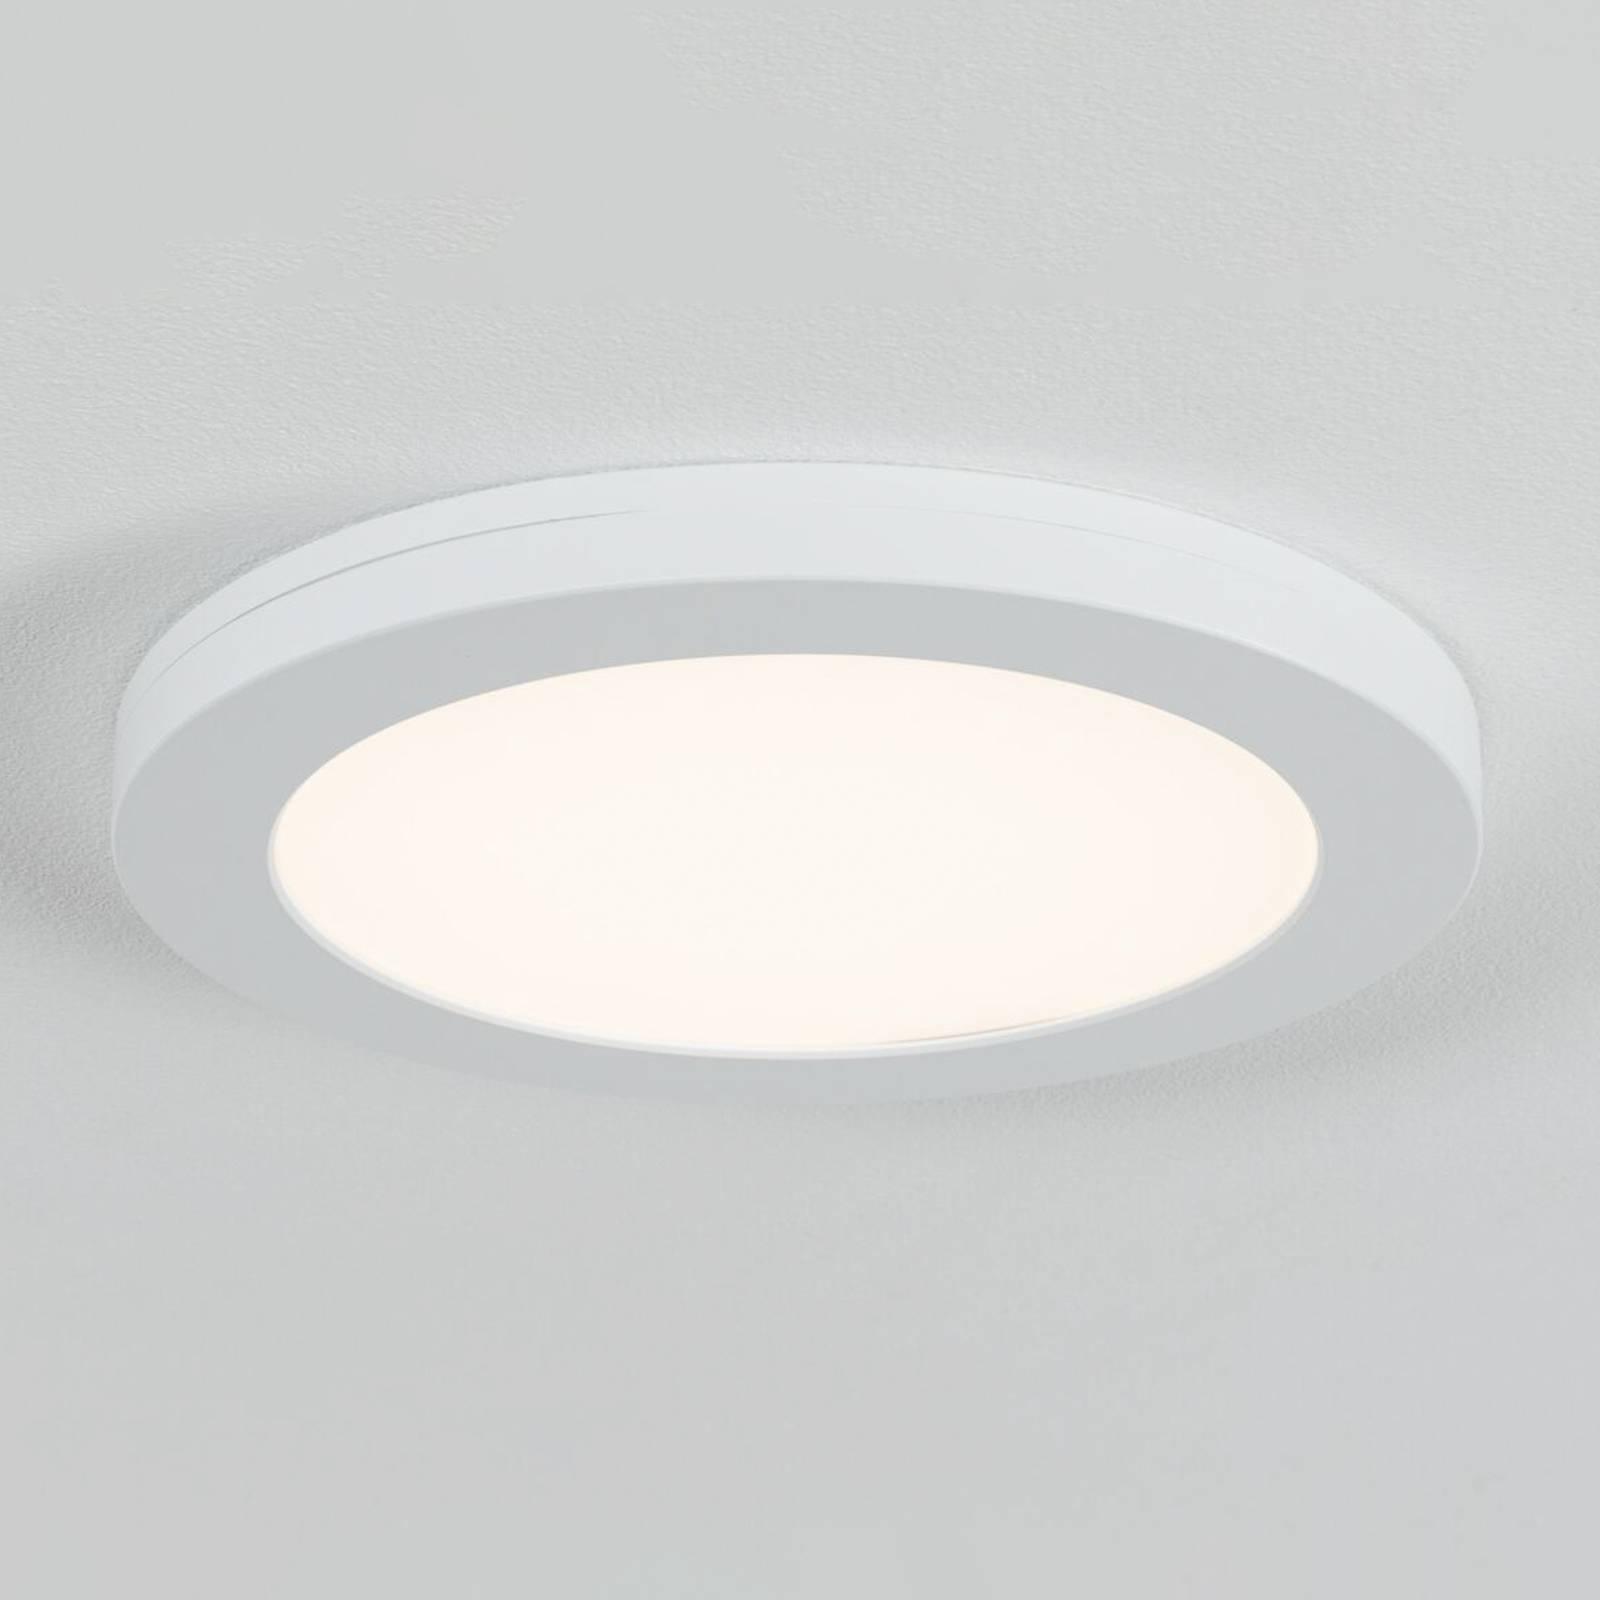 Paulmann Cover it -LED-paneeli anturilla, 22,5 cm